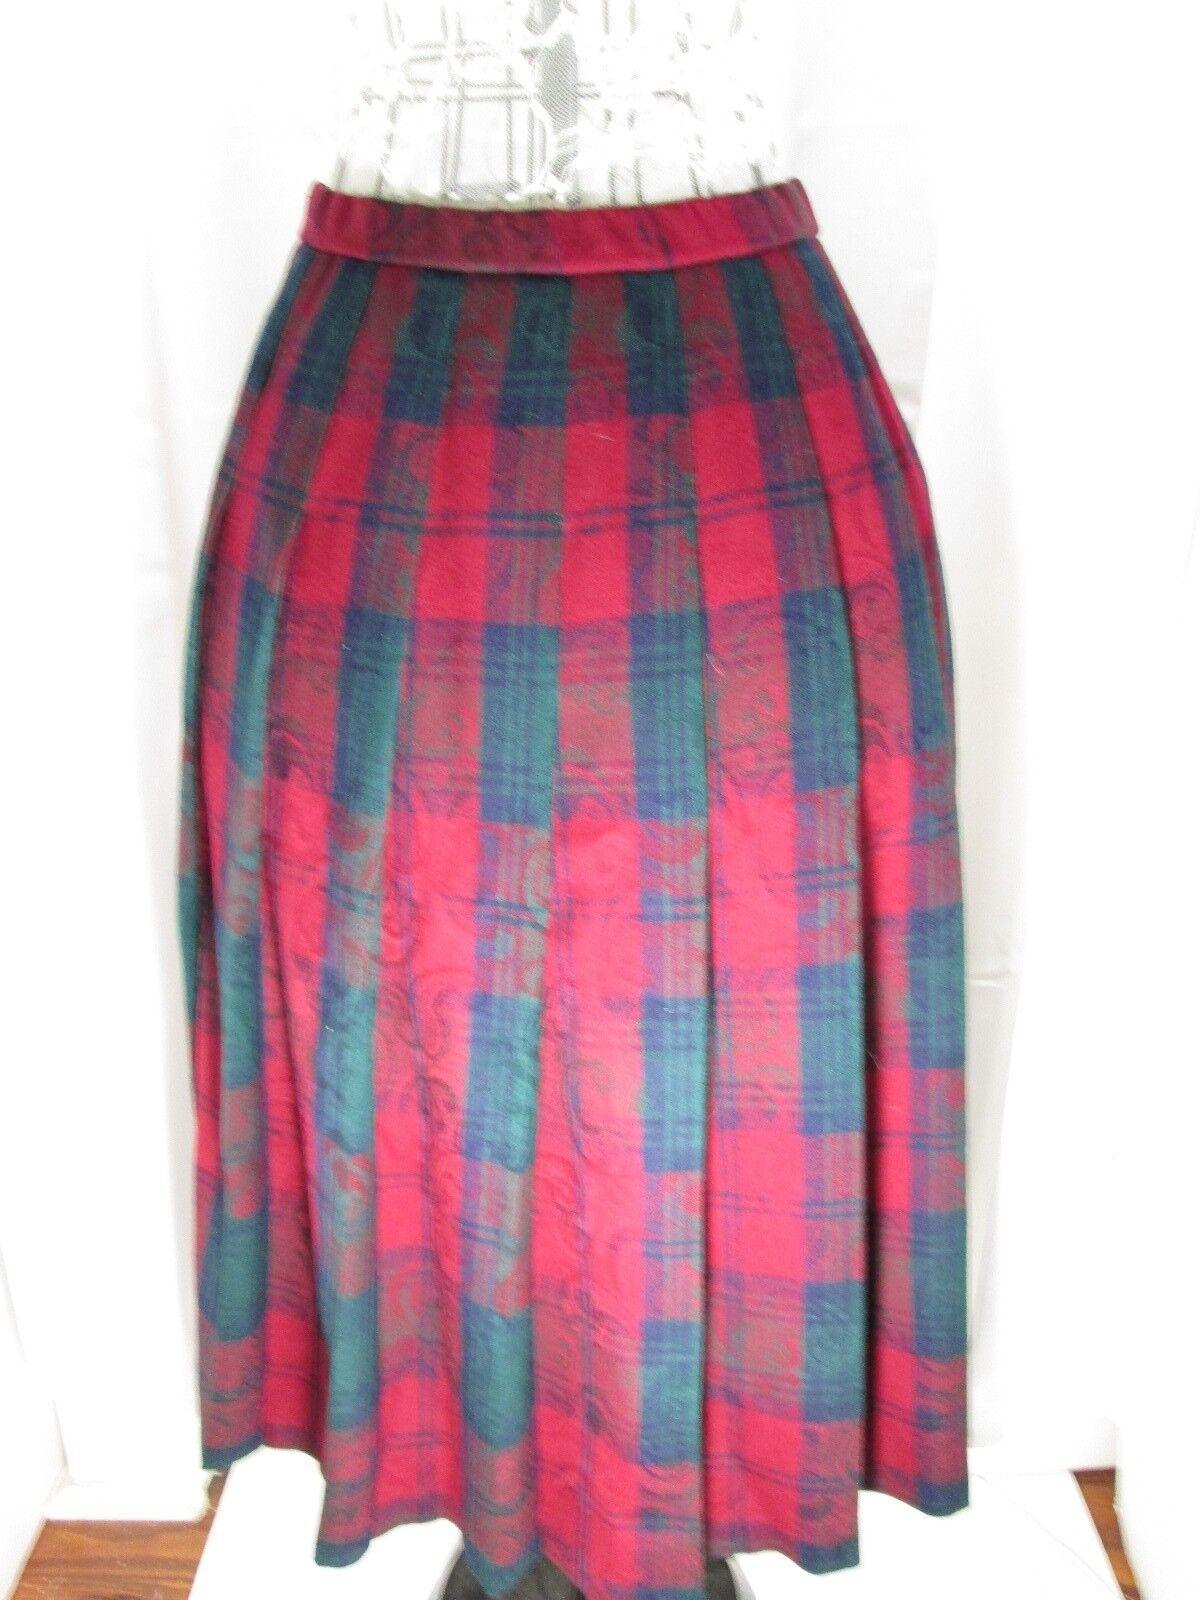 Pendleton Skirt Virgin Wool Pleated Red Green Paisley Print Plaid Unlined 8P